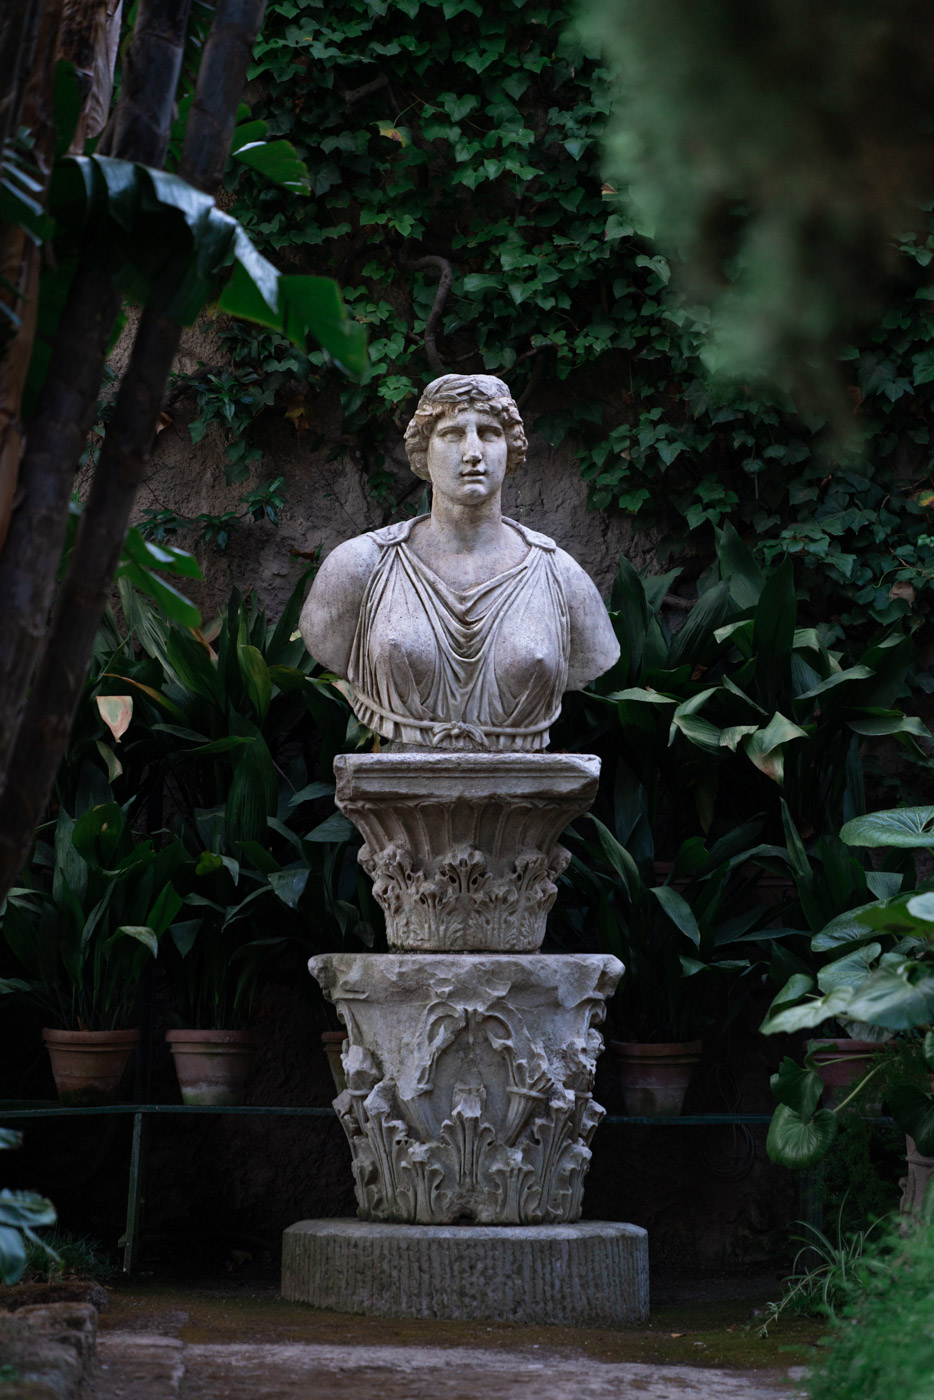 Statue in the gardens at Villa Astor, Sorrento, Italy - photo by Adagion Studio